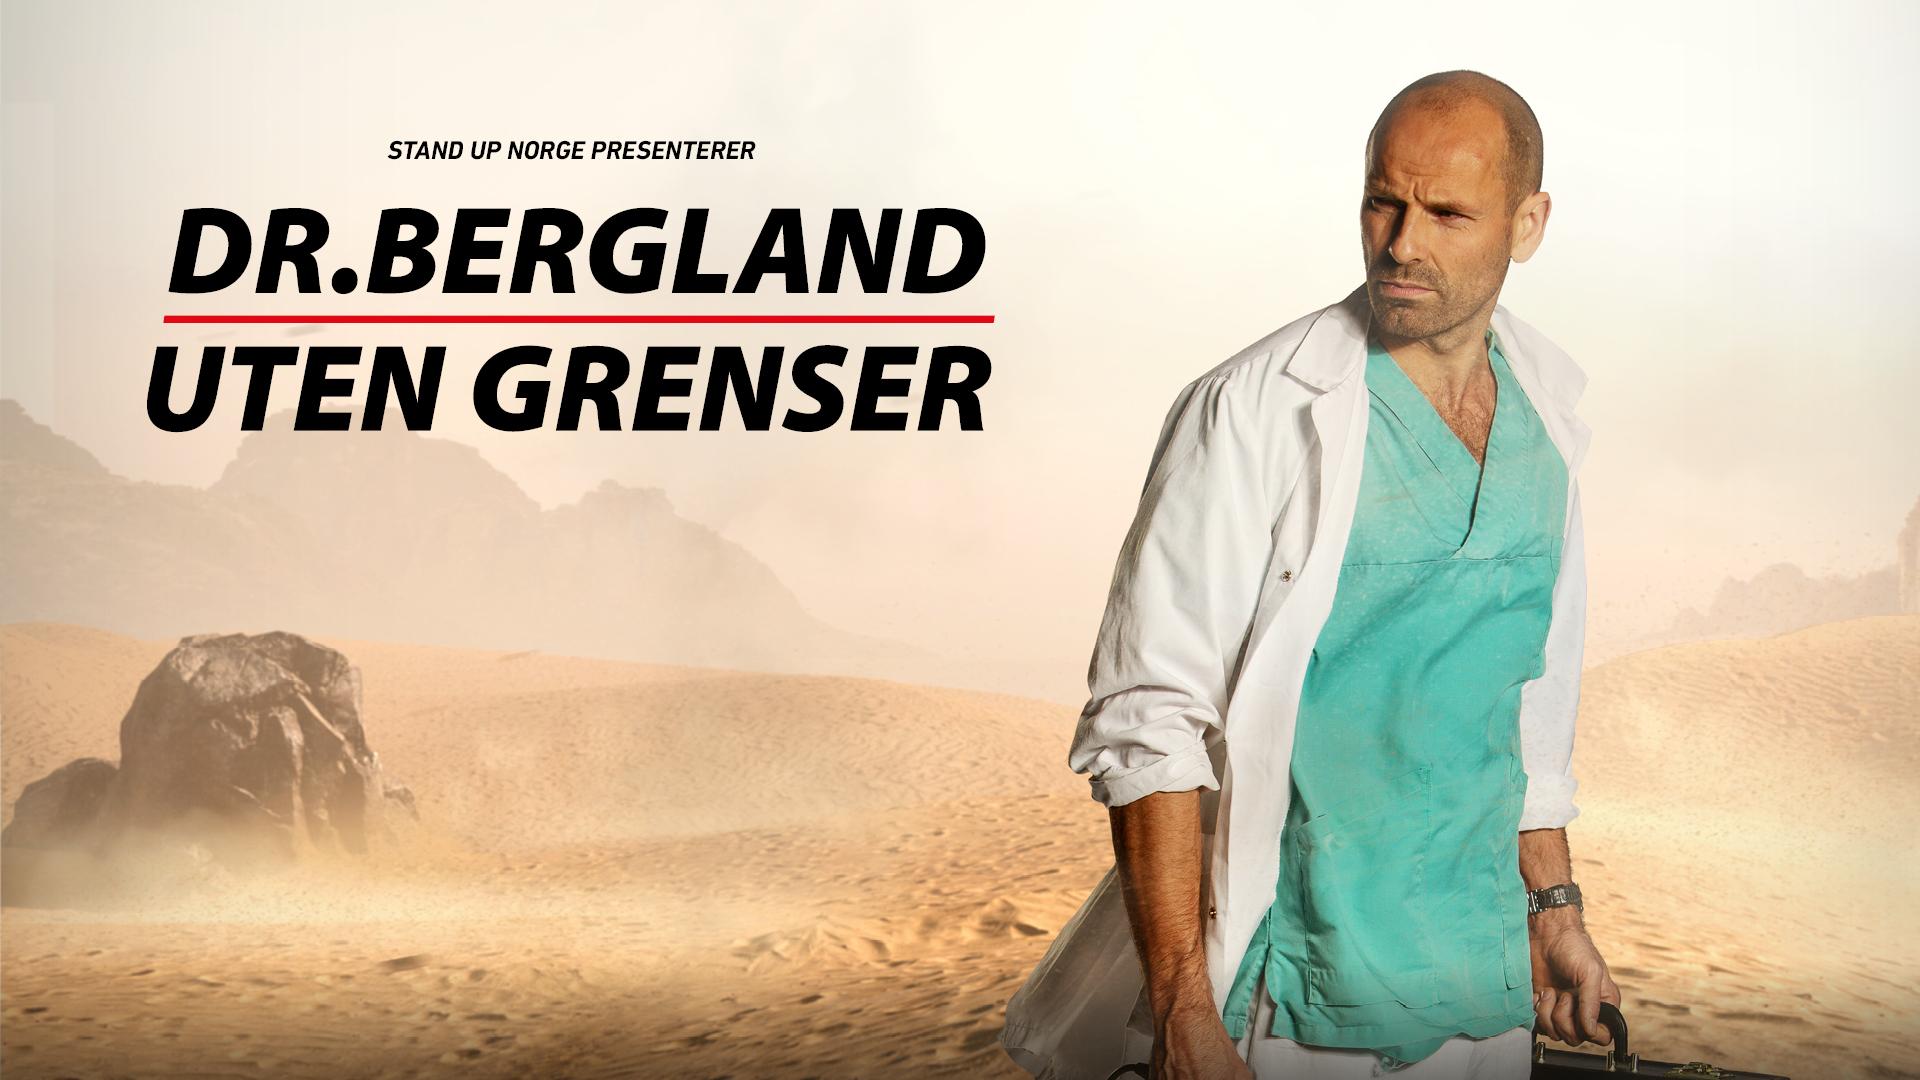 Dr. Bergland